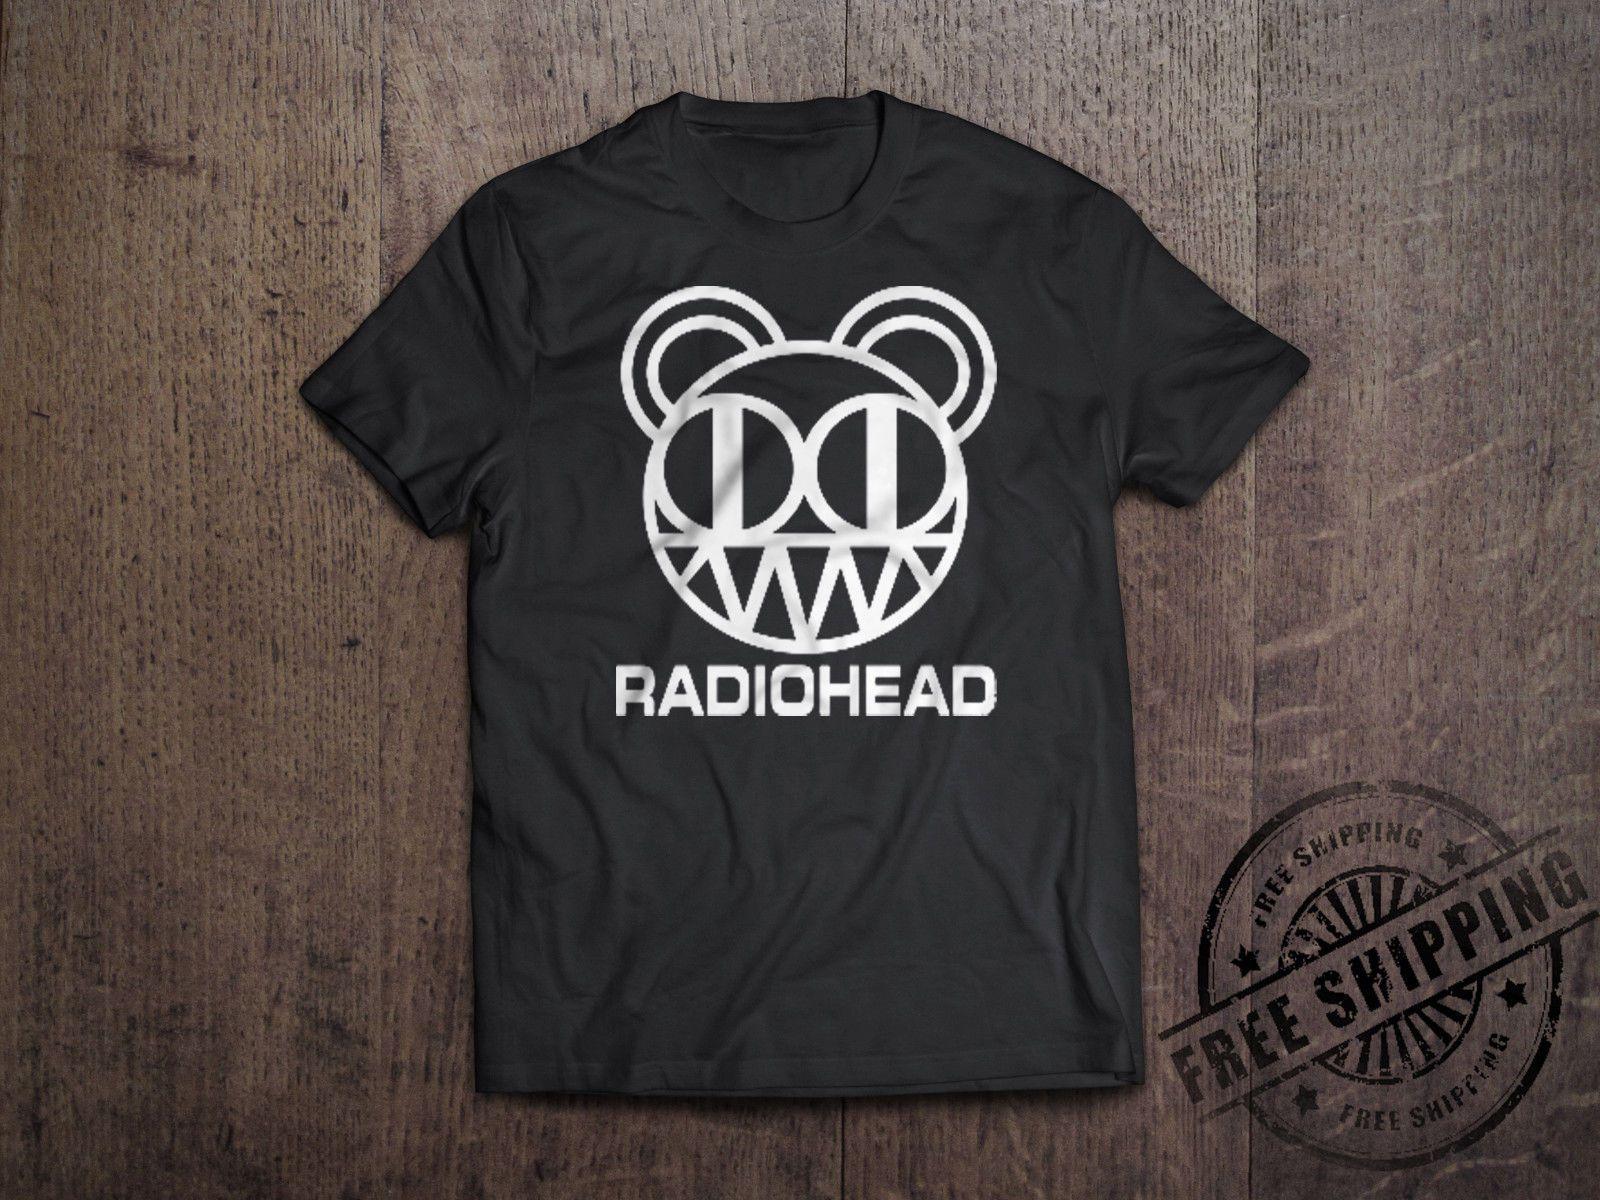 New Radiohead English Rock Band Tour Logo Men/'s White T-Shirt Size S-3XL